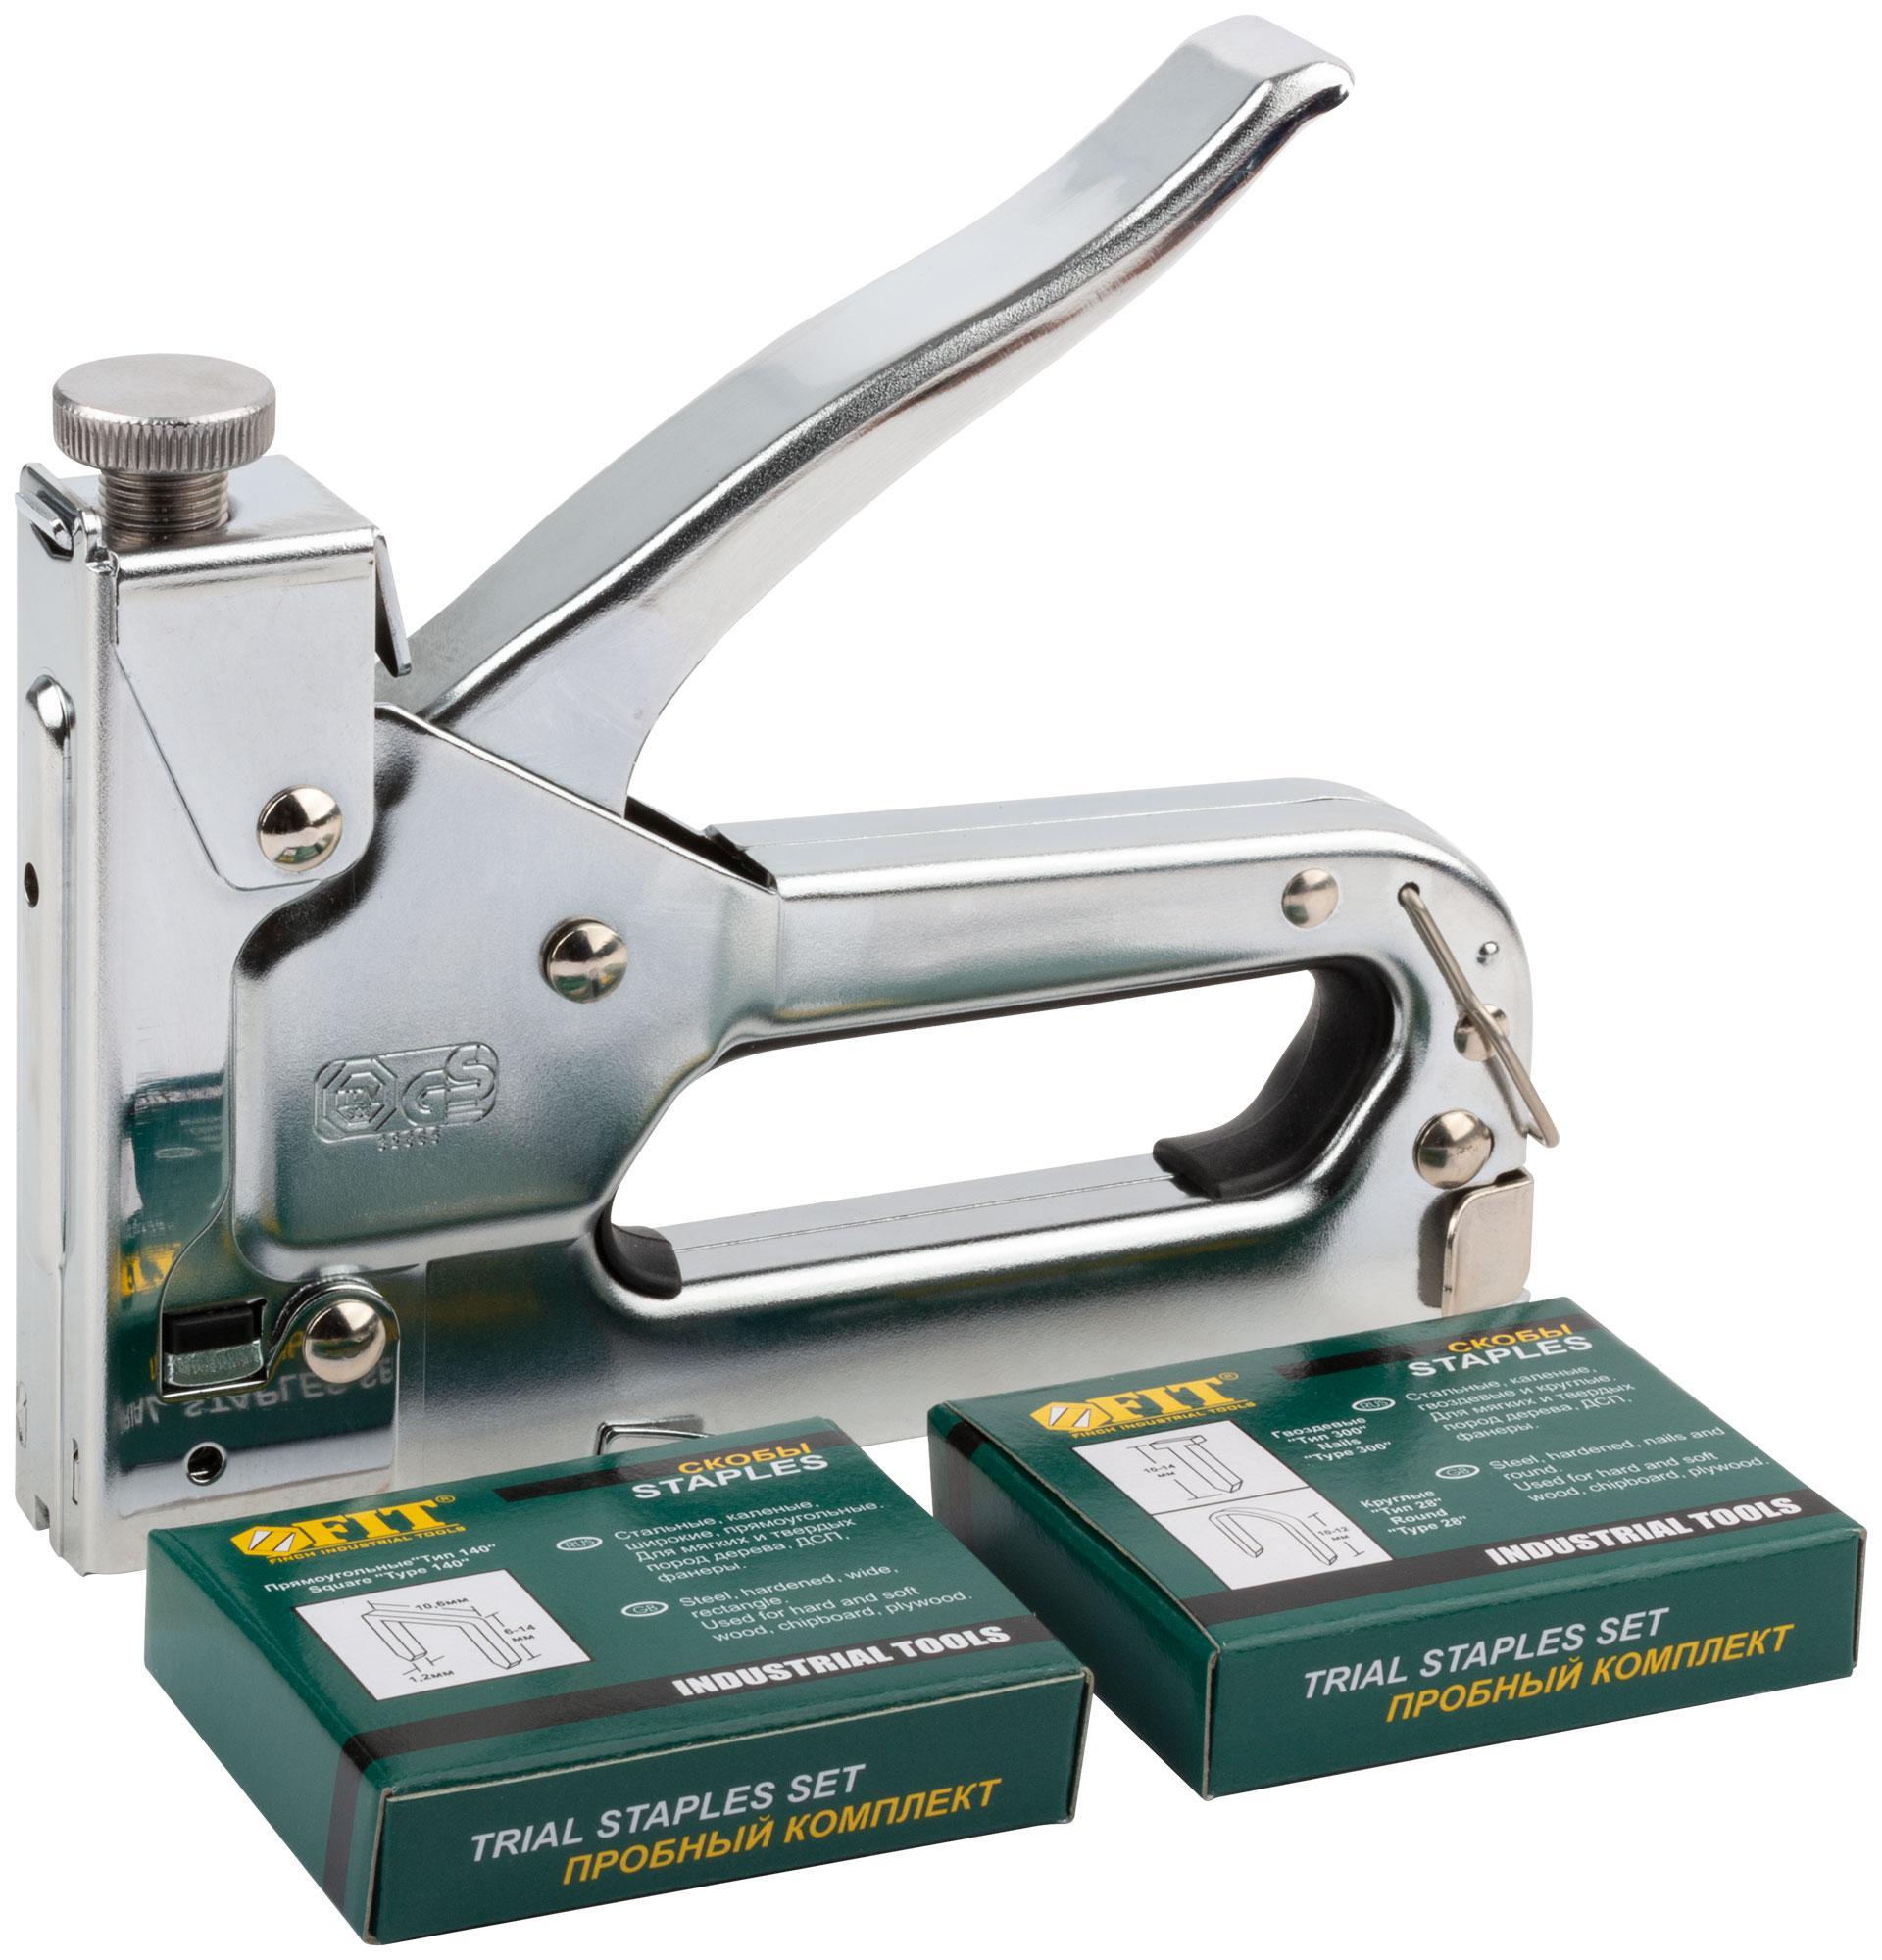 Степлер Fit 32165 степлер для узких скоб fit 32123